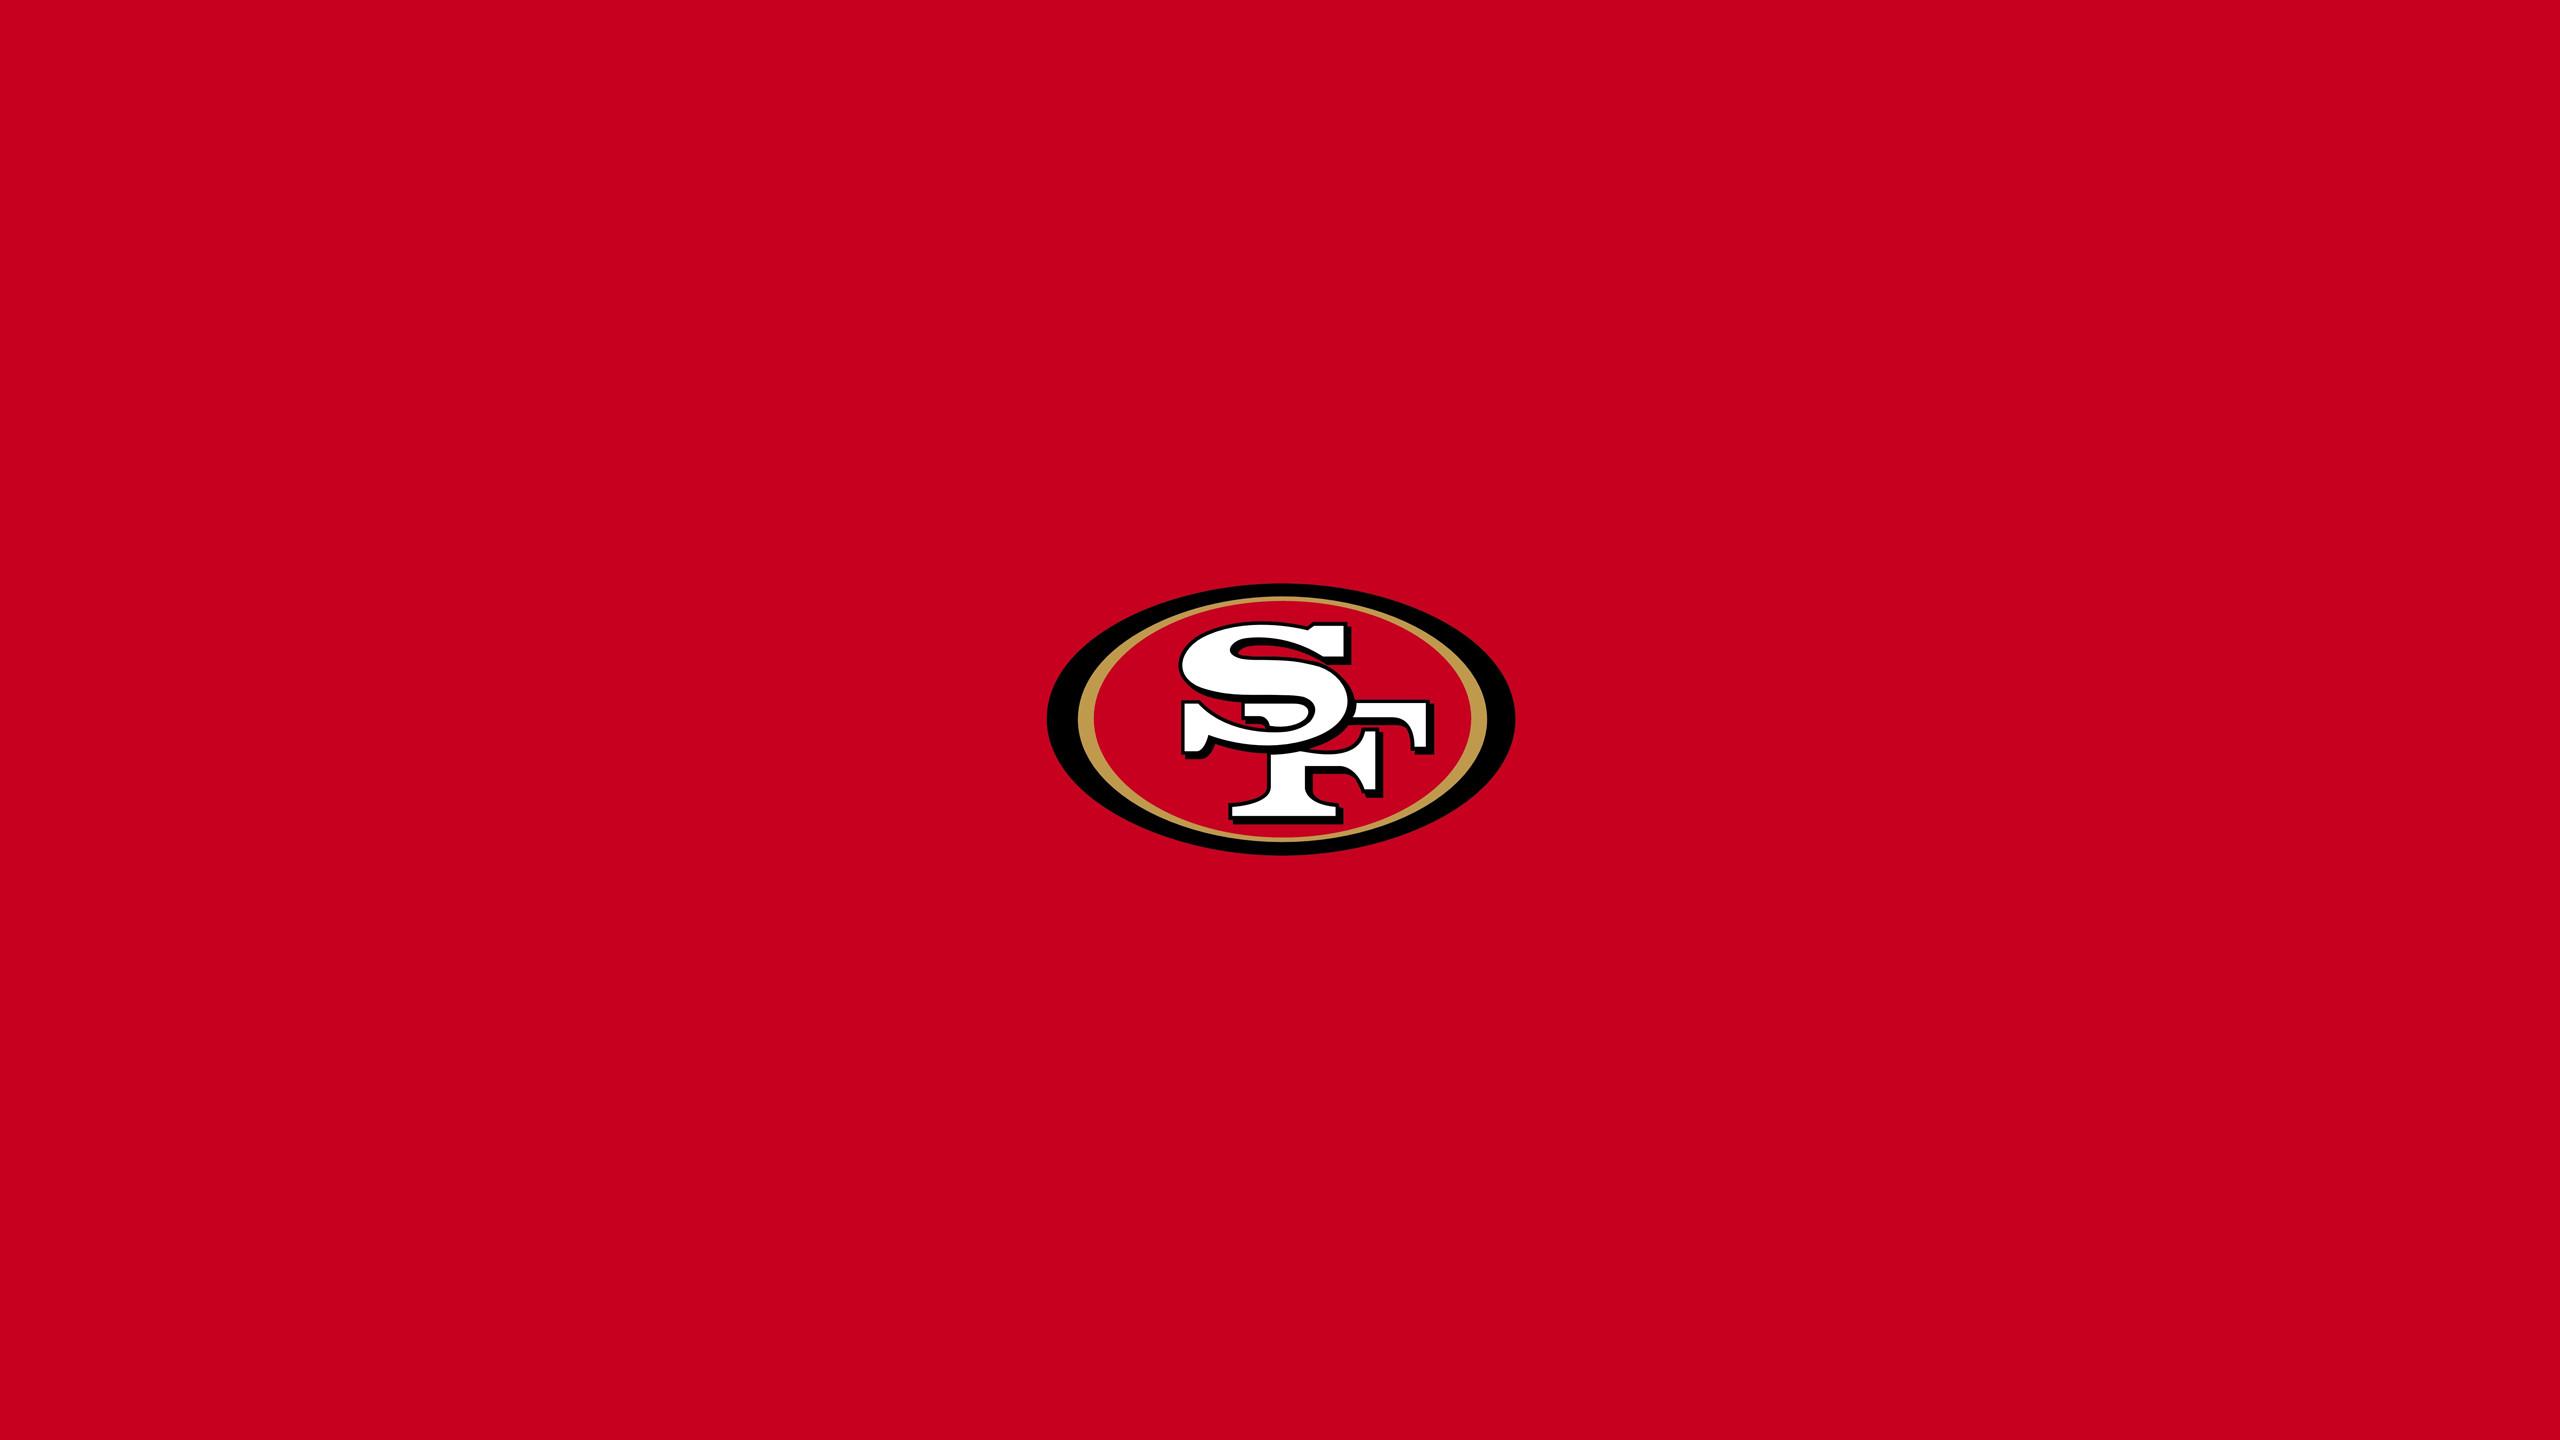 11 HD San Francisco 49ers Wallpapers